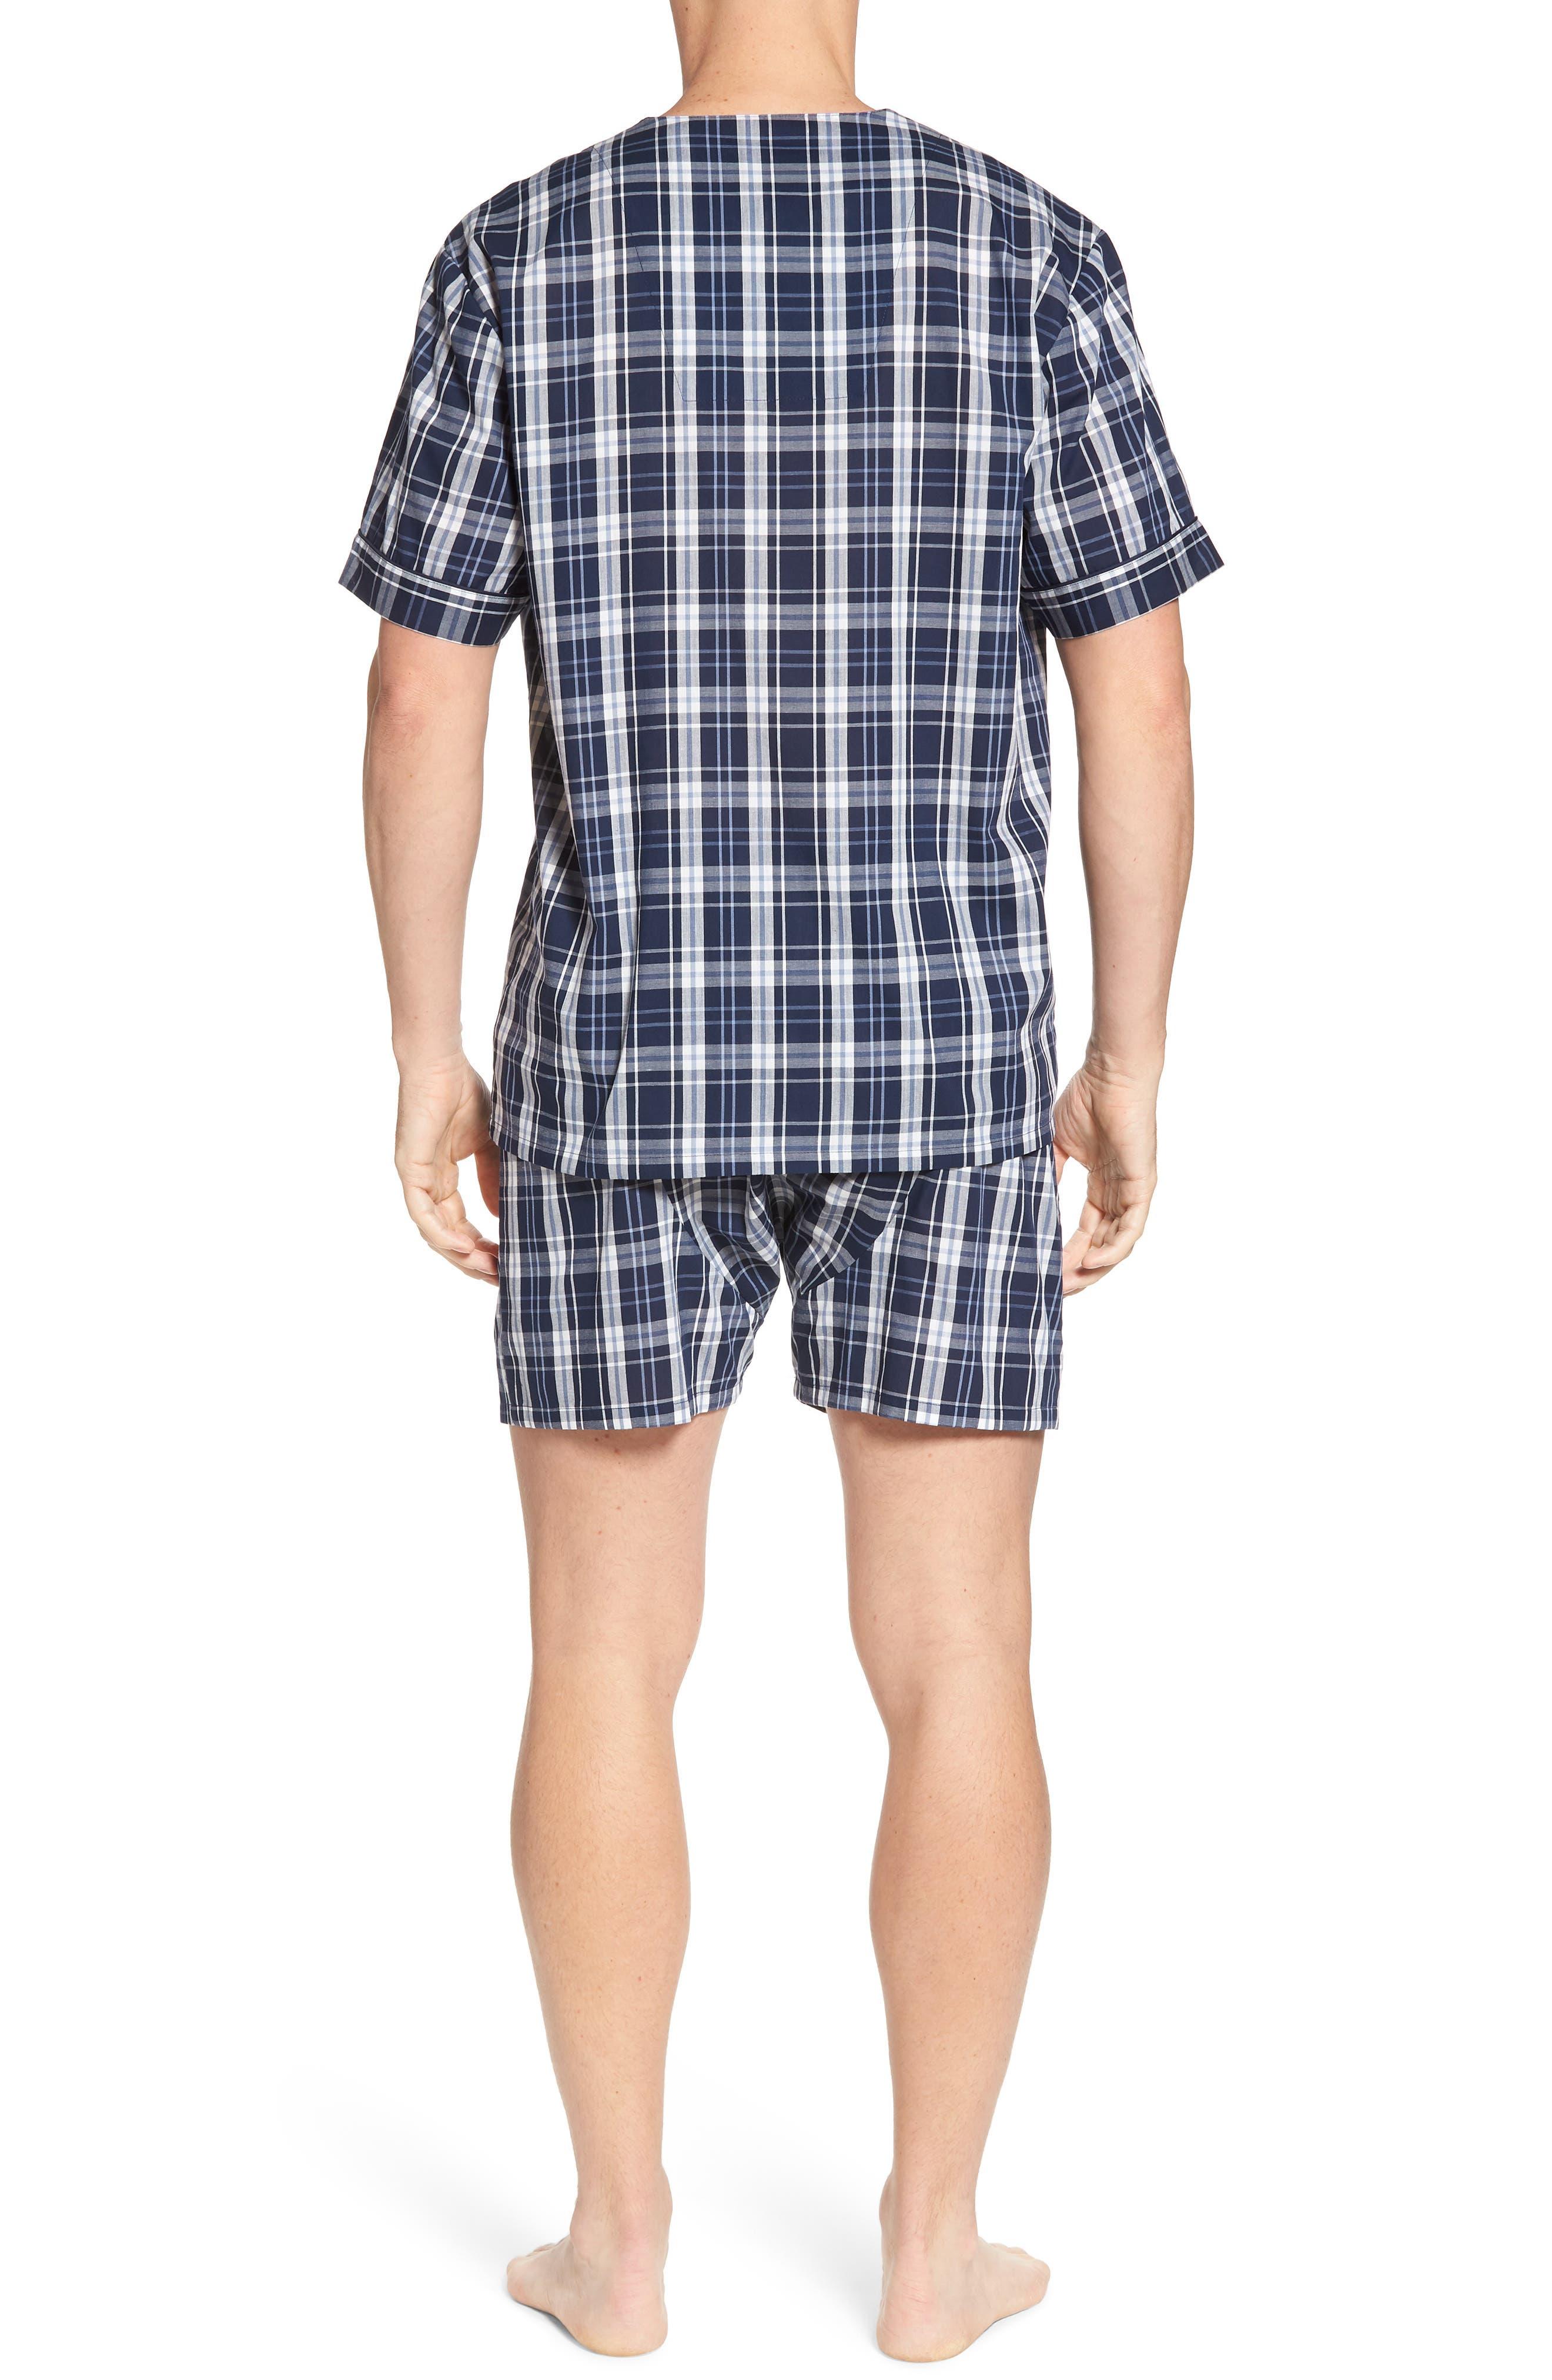 Carefree Shorty Pajama Set,                             Alternate thumbnail 2, color,                             400